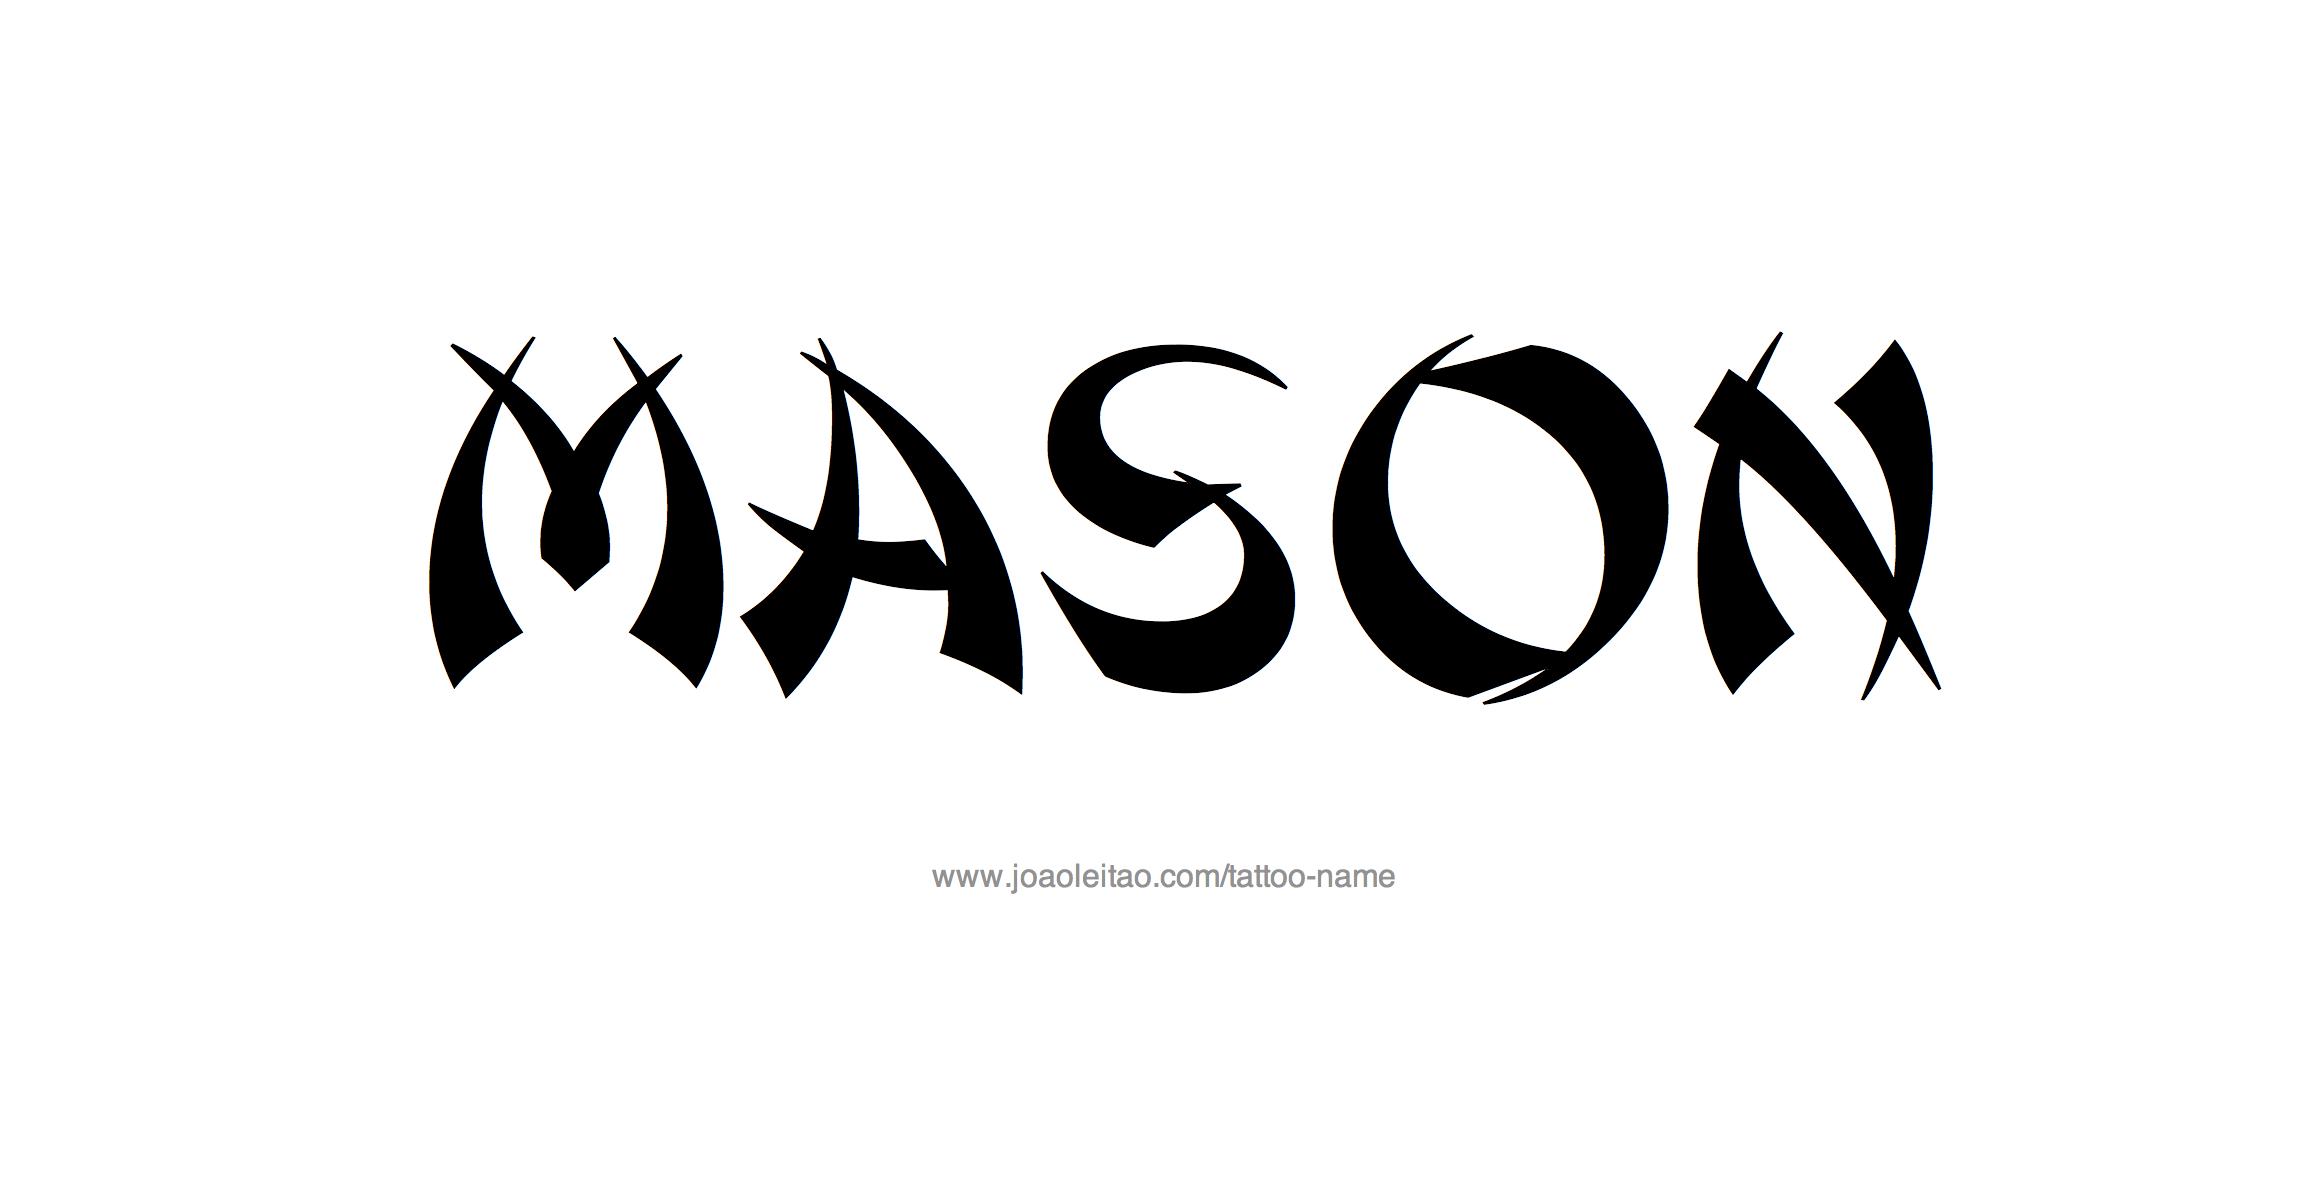 Mason Name Tattoo Designs